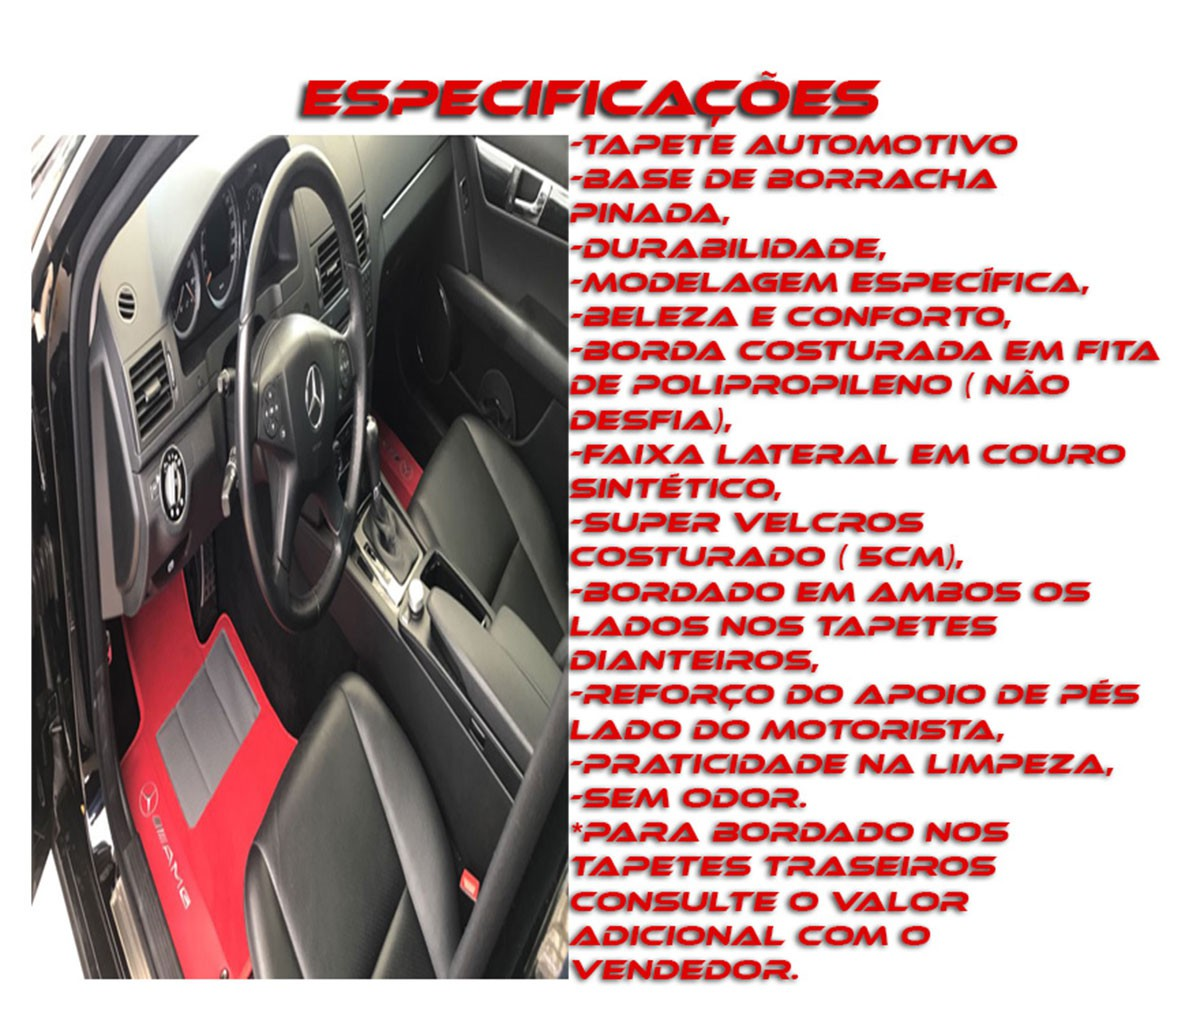 Kit Tapete Assoalho+ Porta Malas Hyundai Hb20 Carpete Luxo